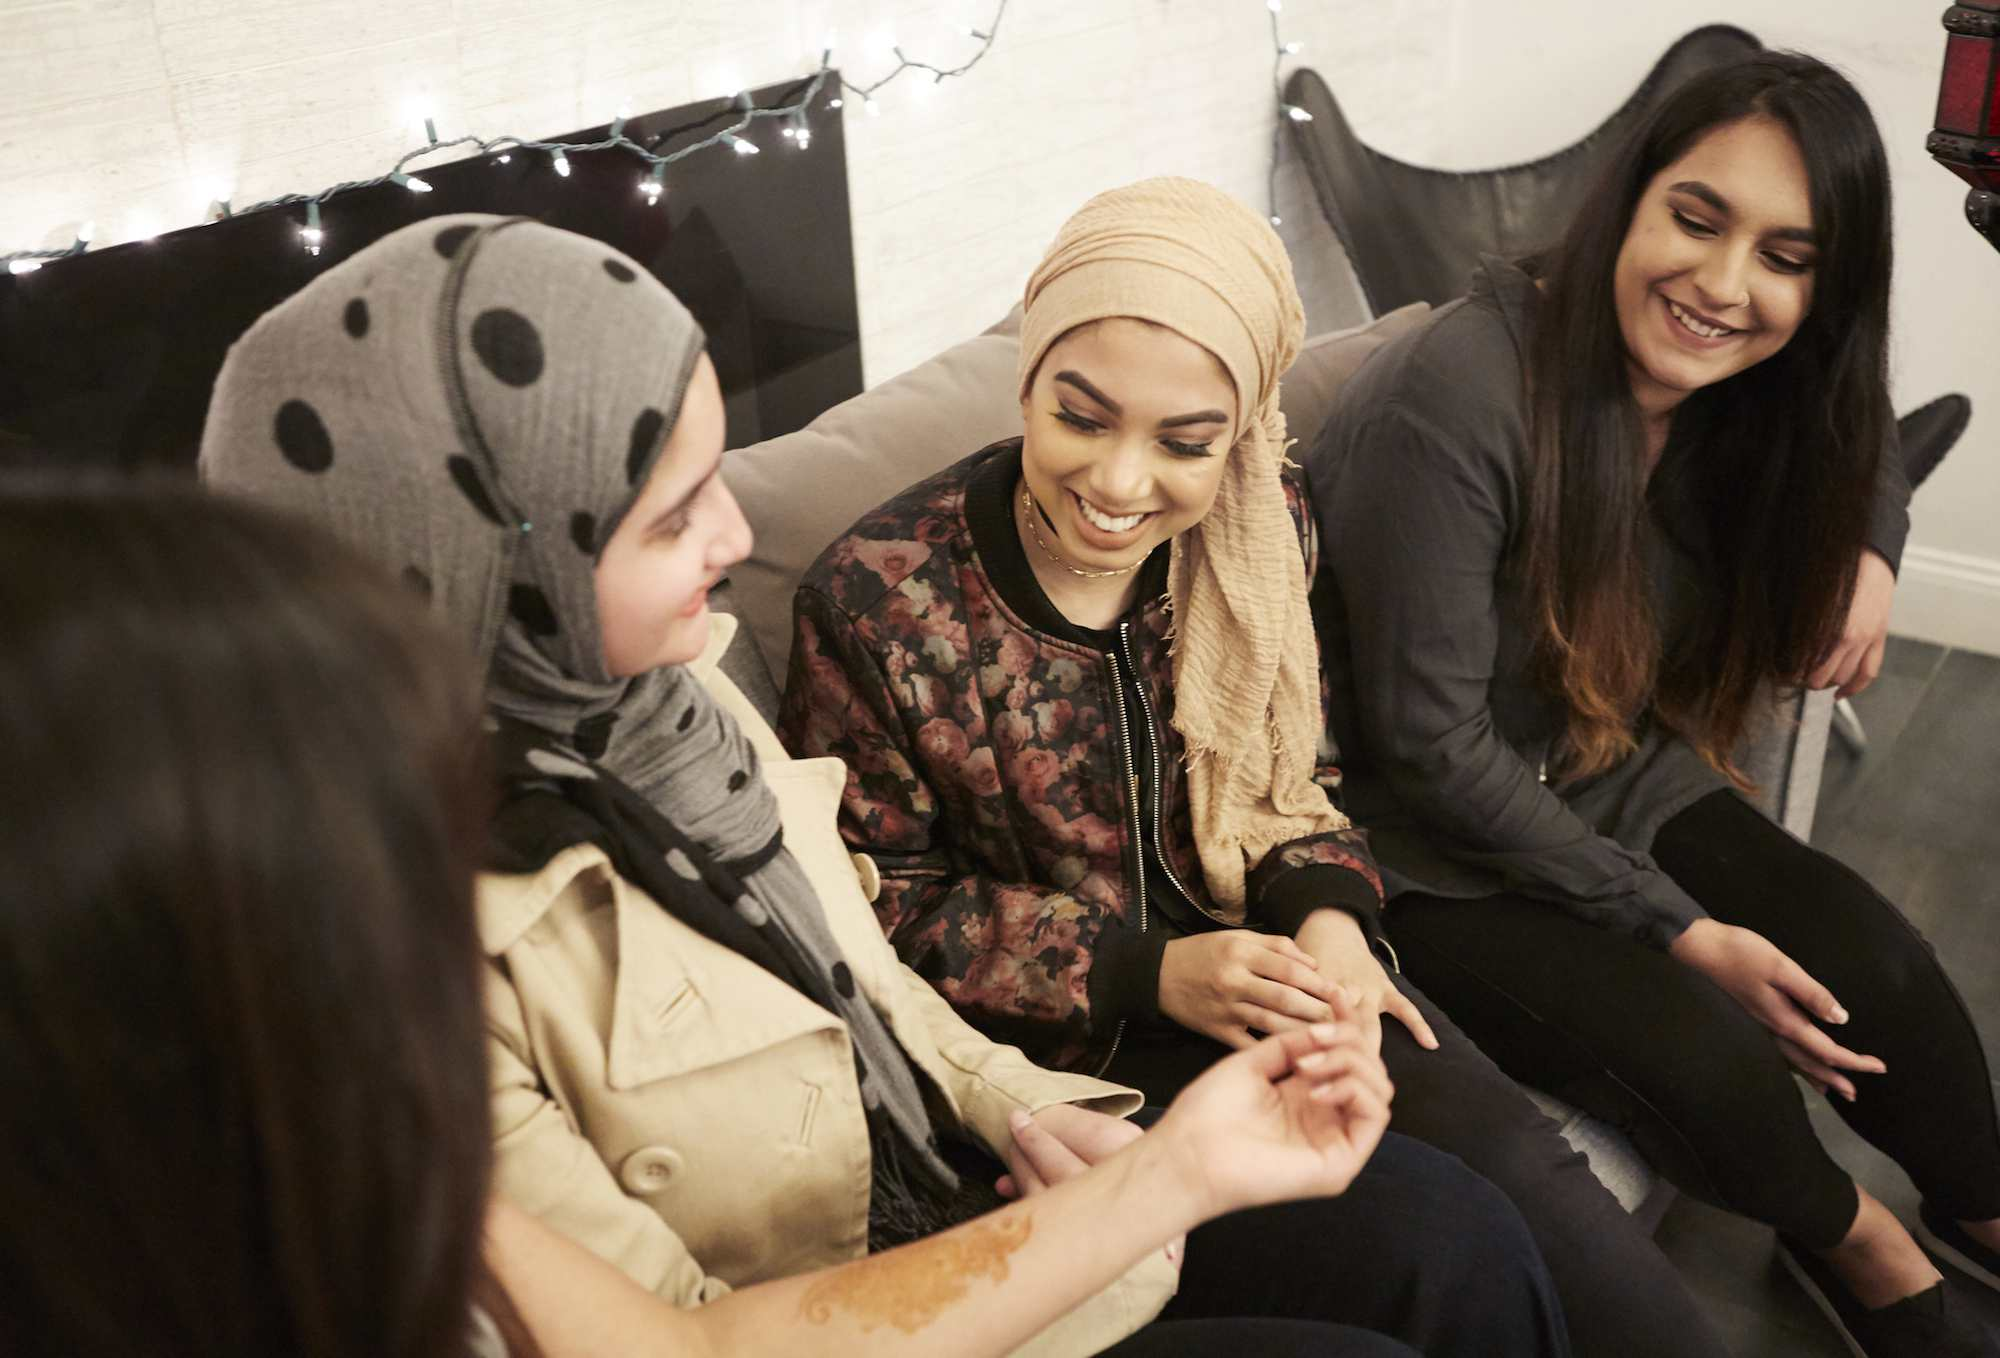 Muslim girls conversing